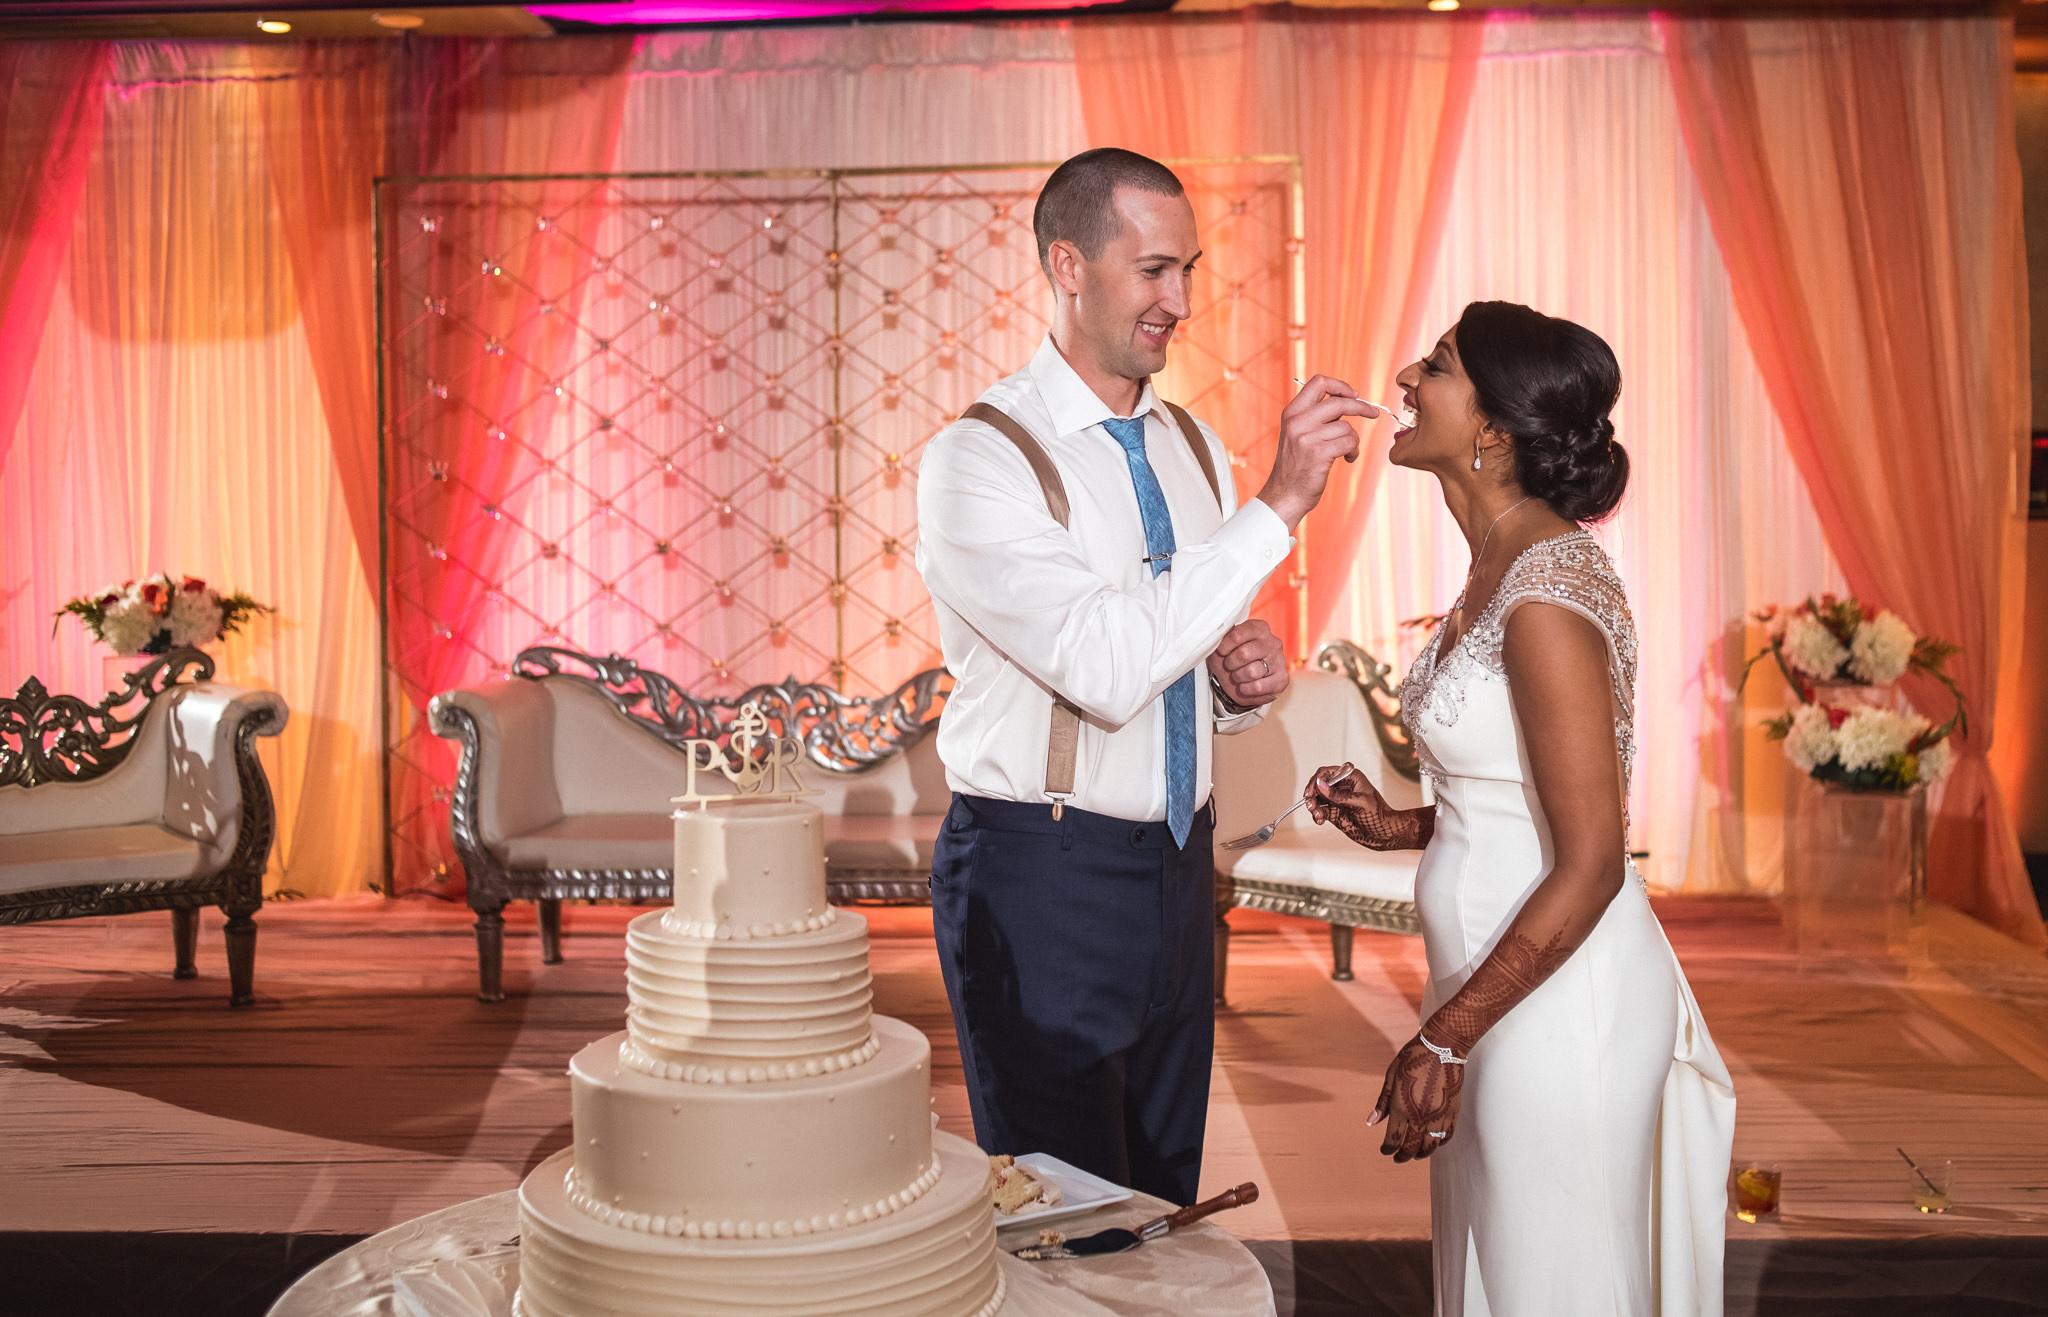 wedding-reception-at-the-imperia.jpg